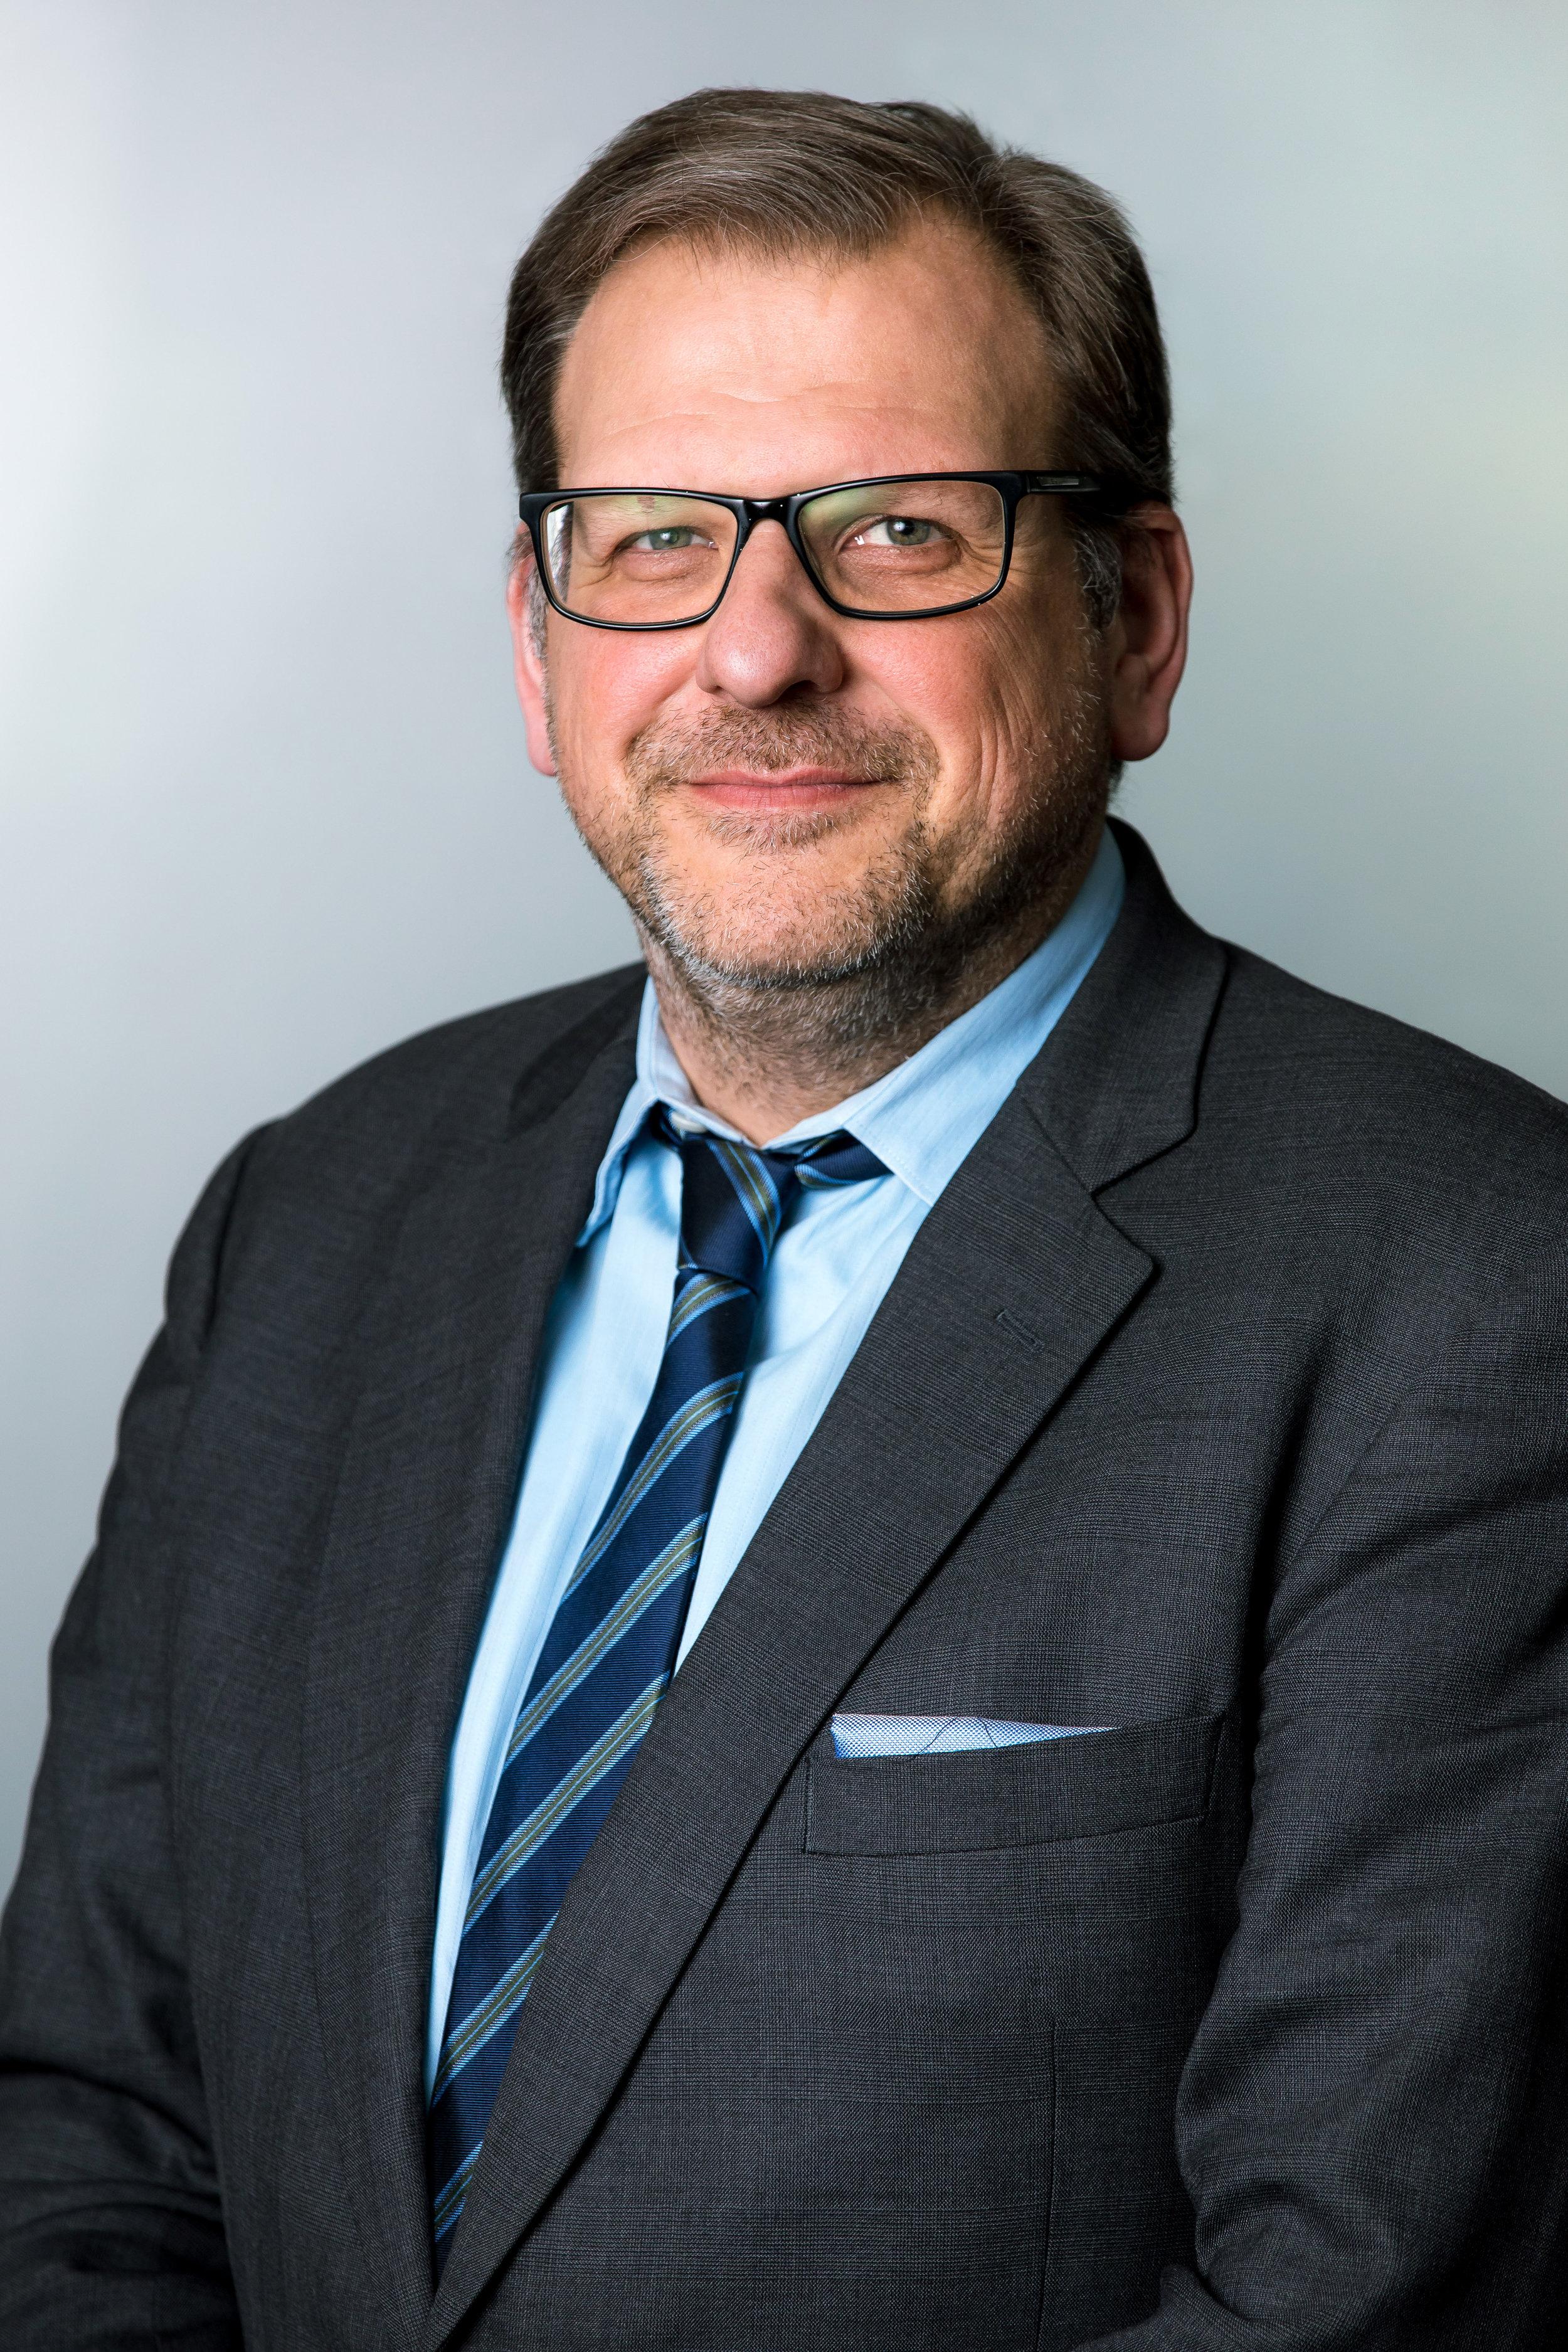 James G. Schureck   Director of Business Development